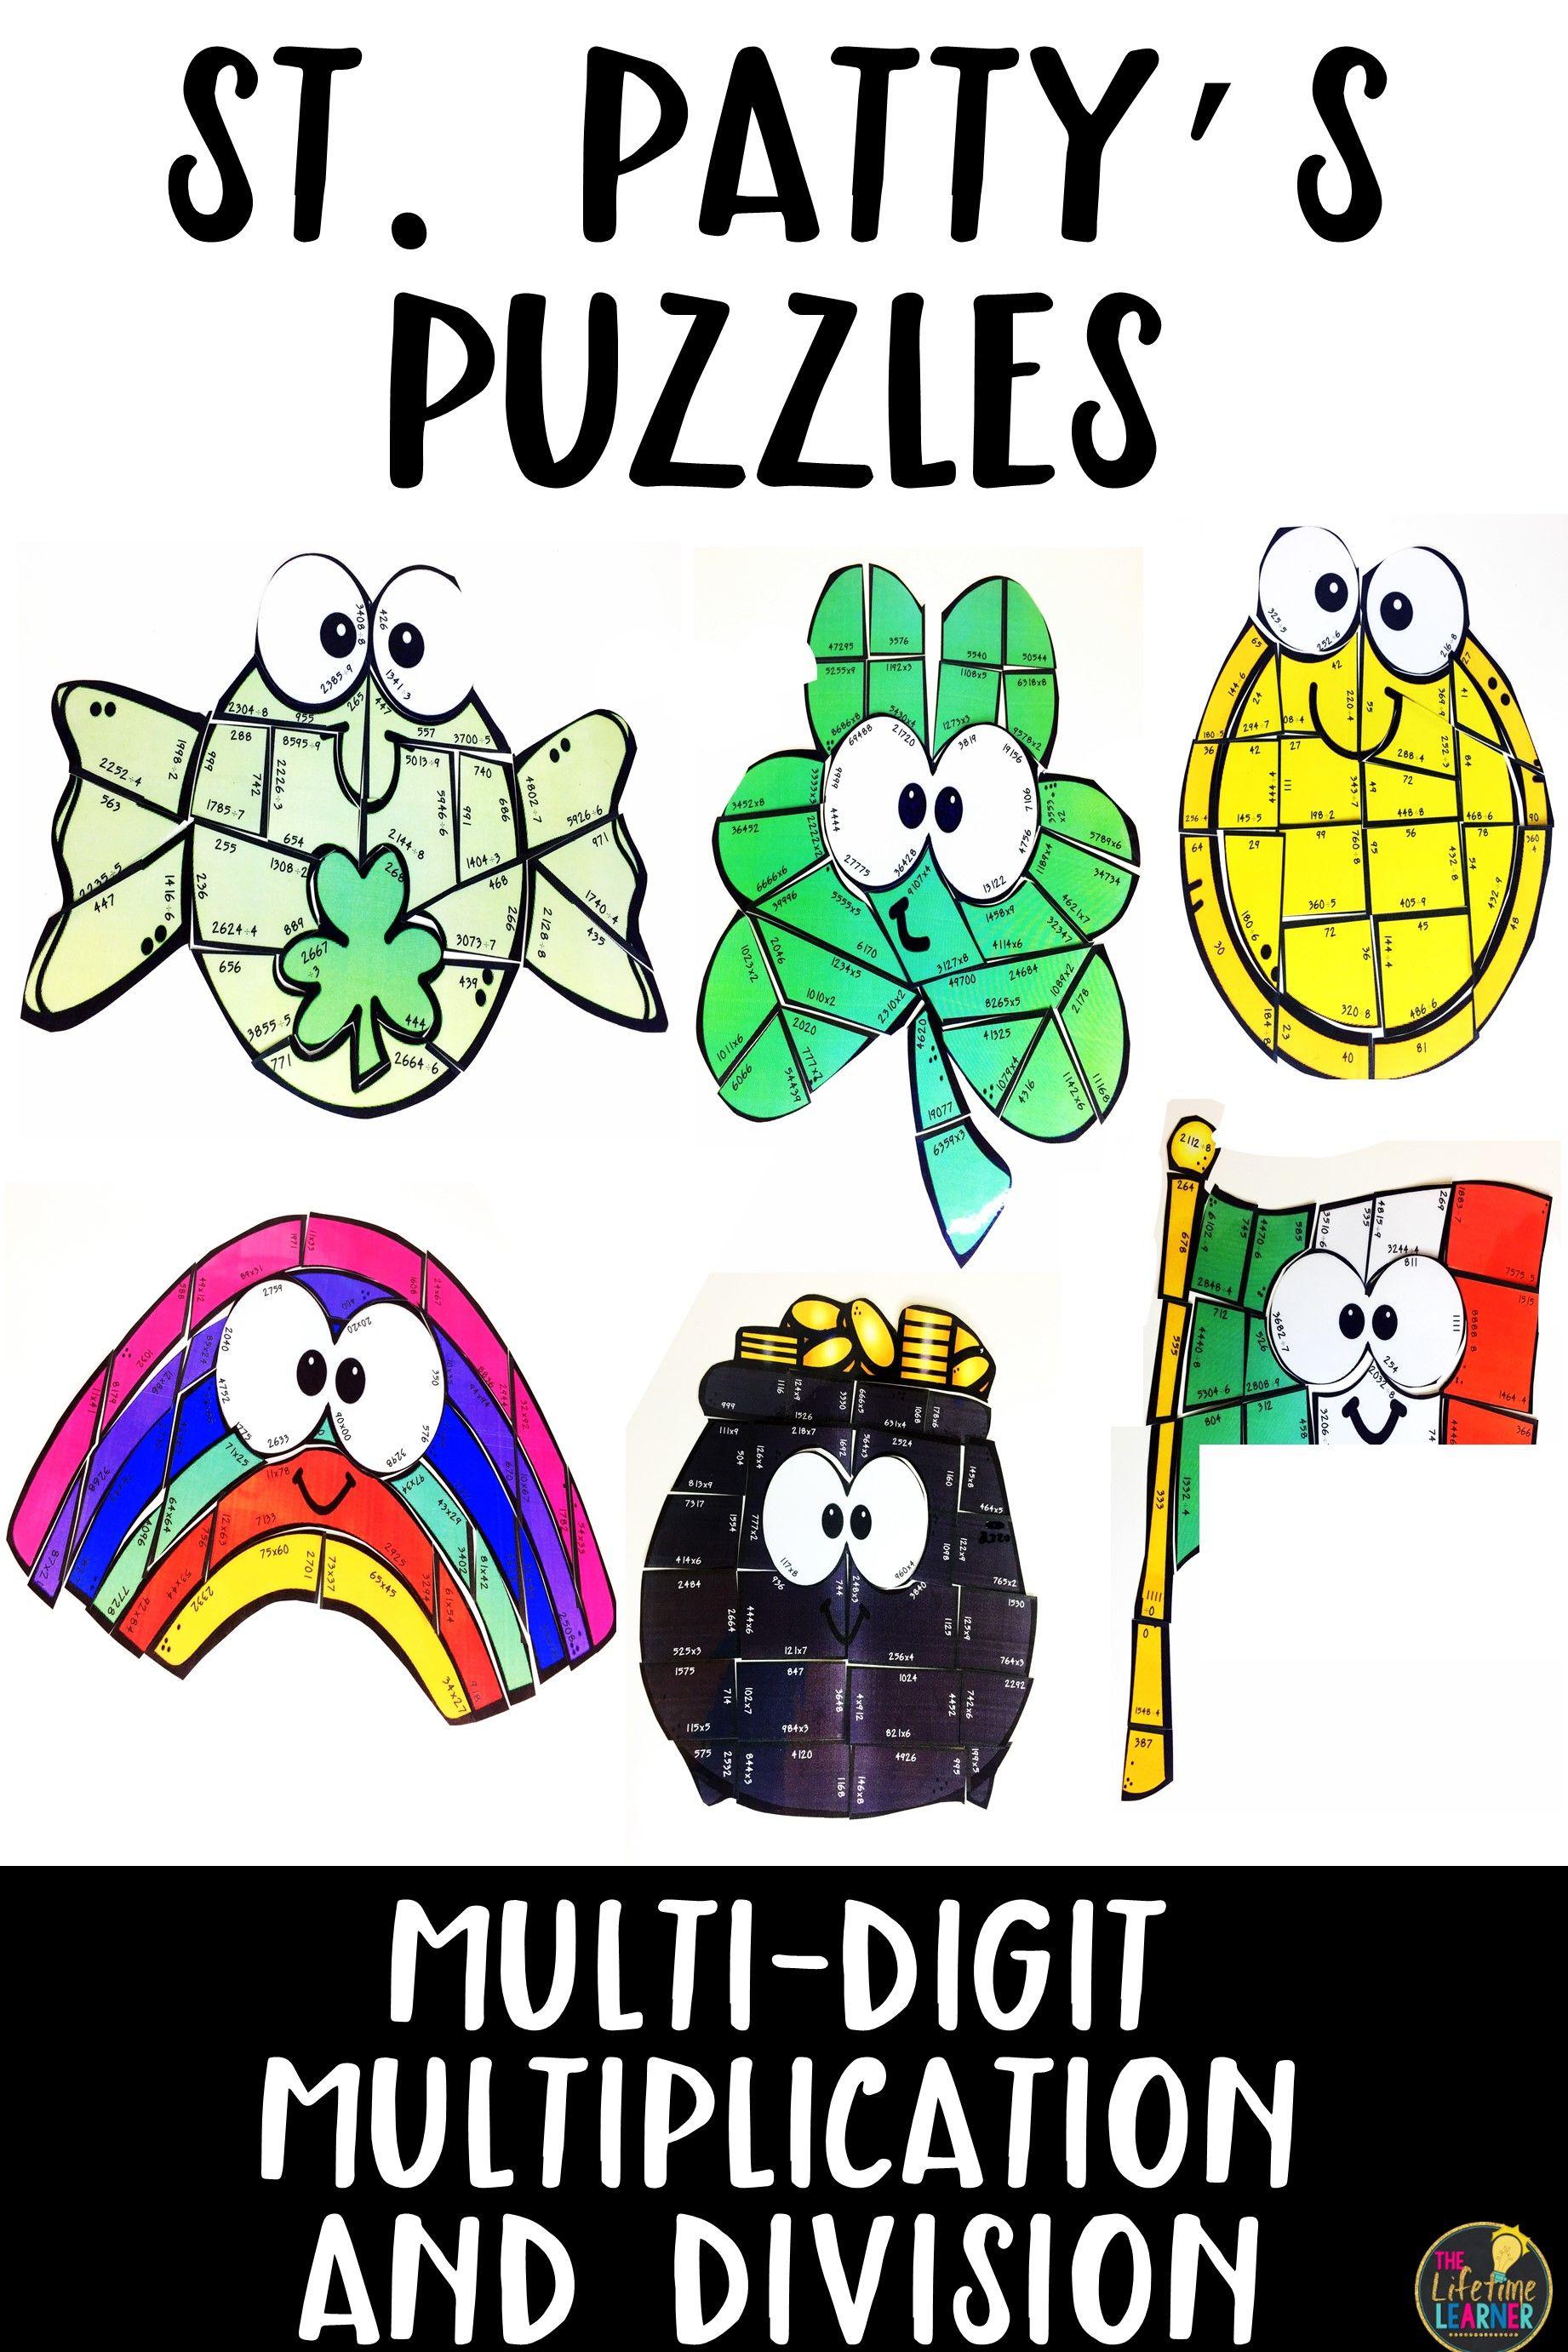 Multi Digit Multiplication And Division Puzzles